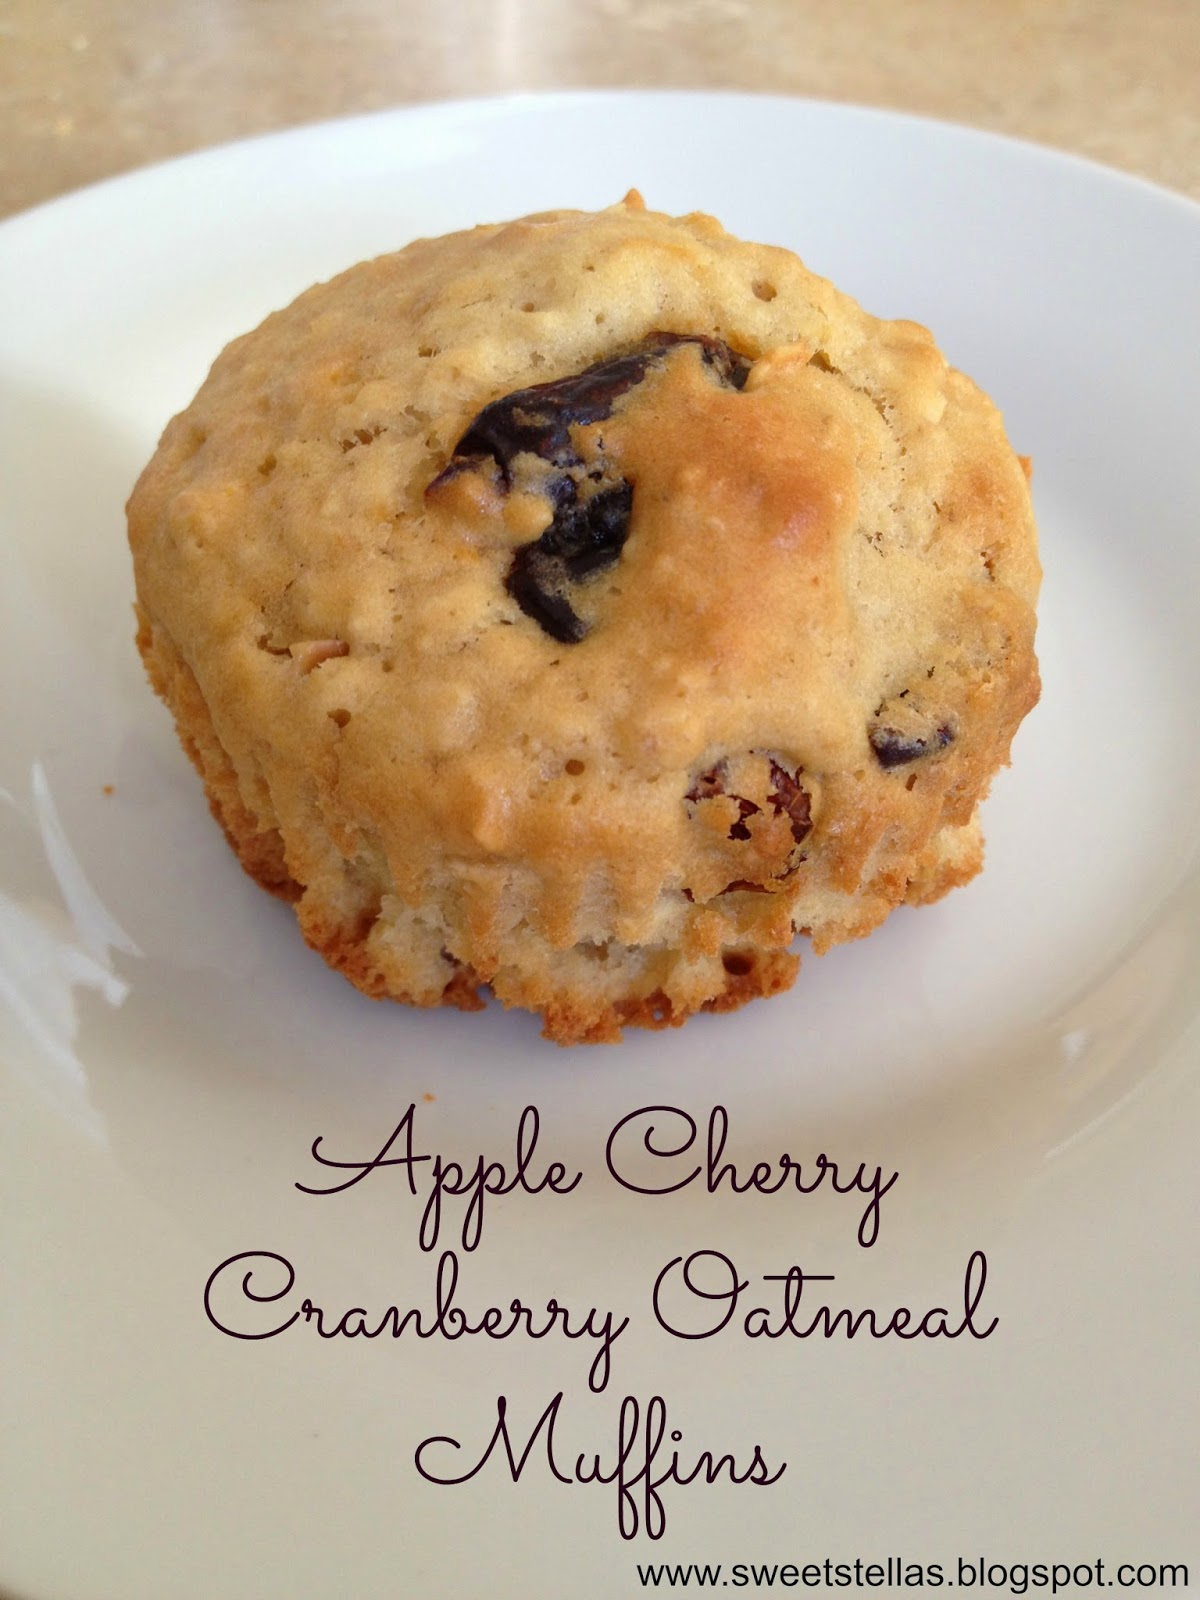 Sweet Stella's: Apple Cherry Cranberry Oatmeal Muffin #recipe